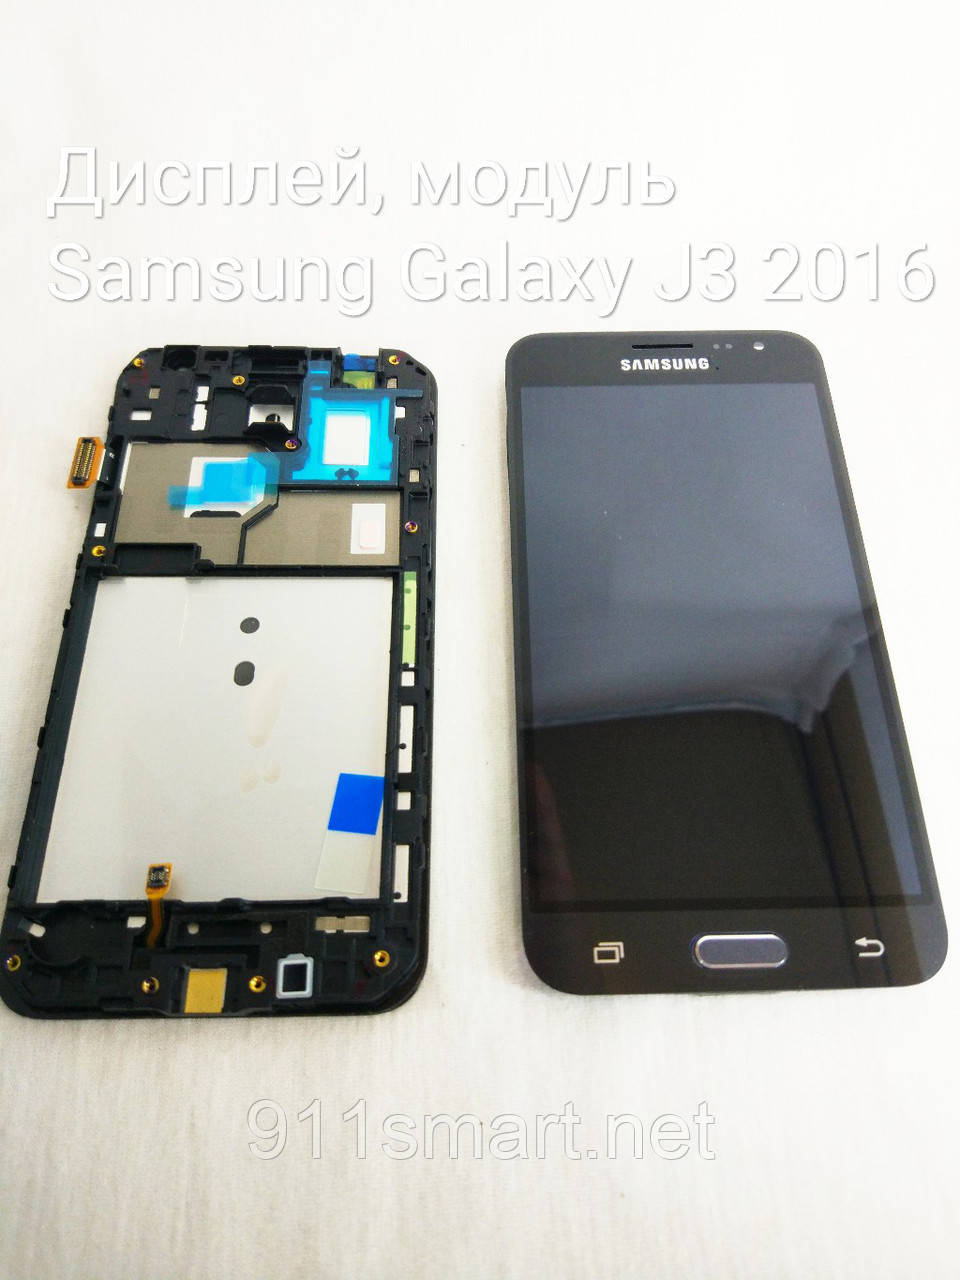 Модуль, LCD дисплей с рамкой Samsung Galaxy J3 J320 2016 черный